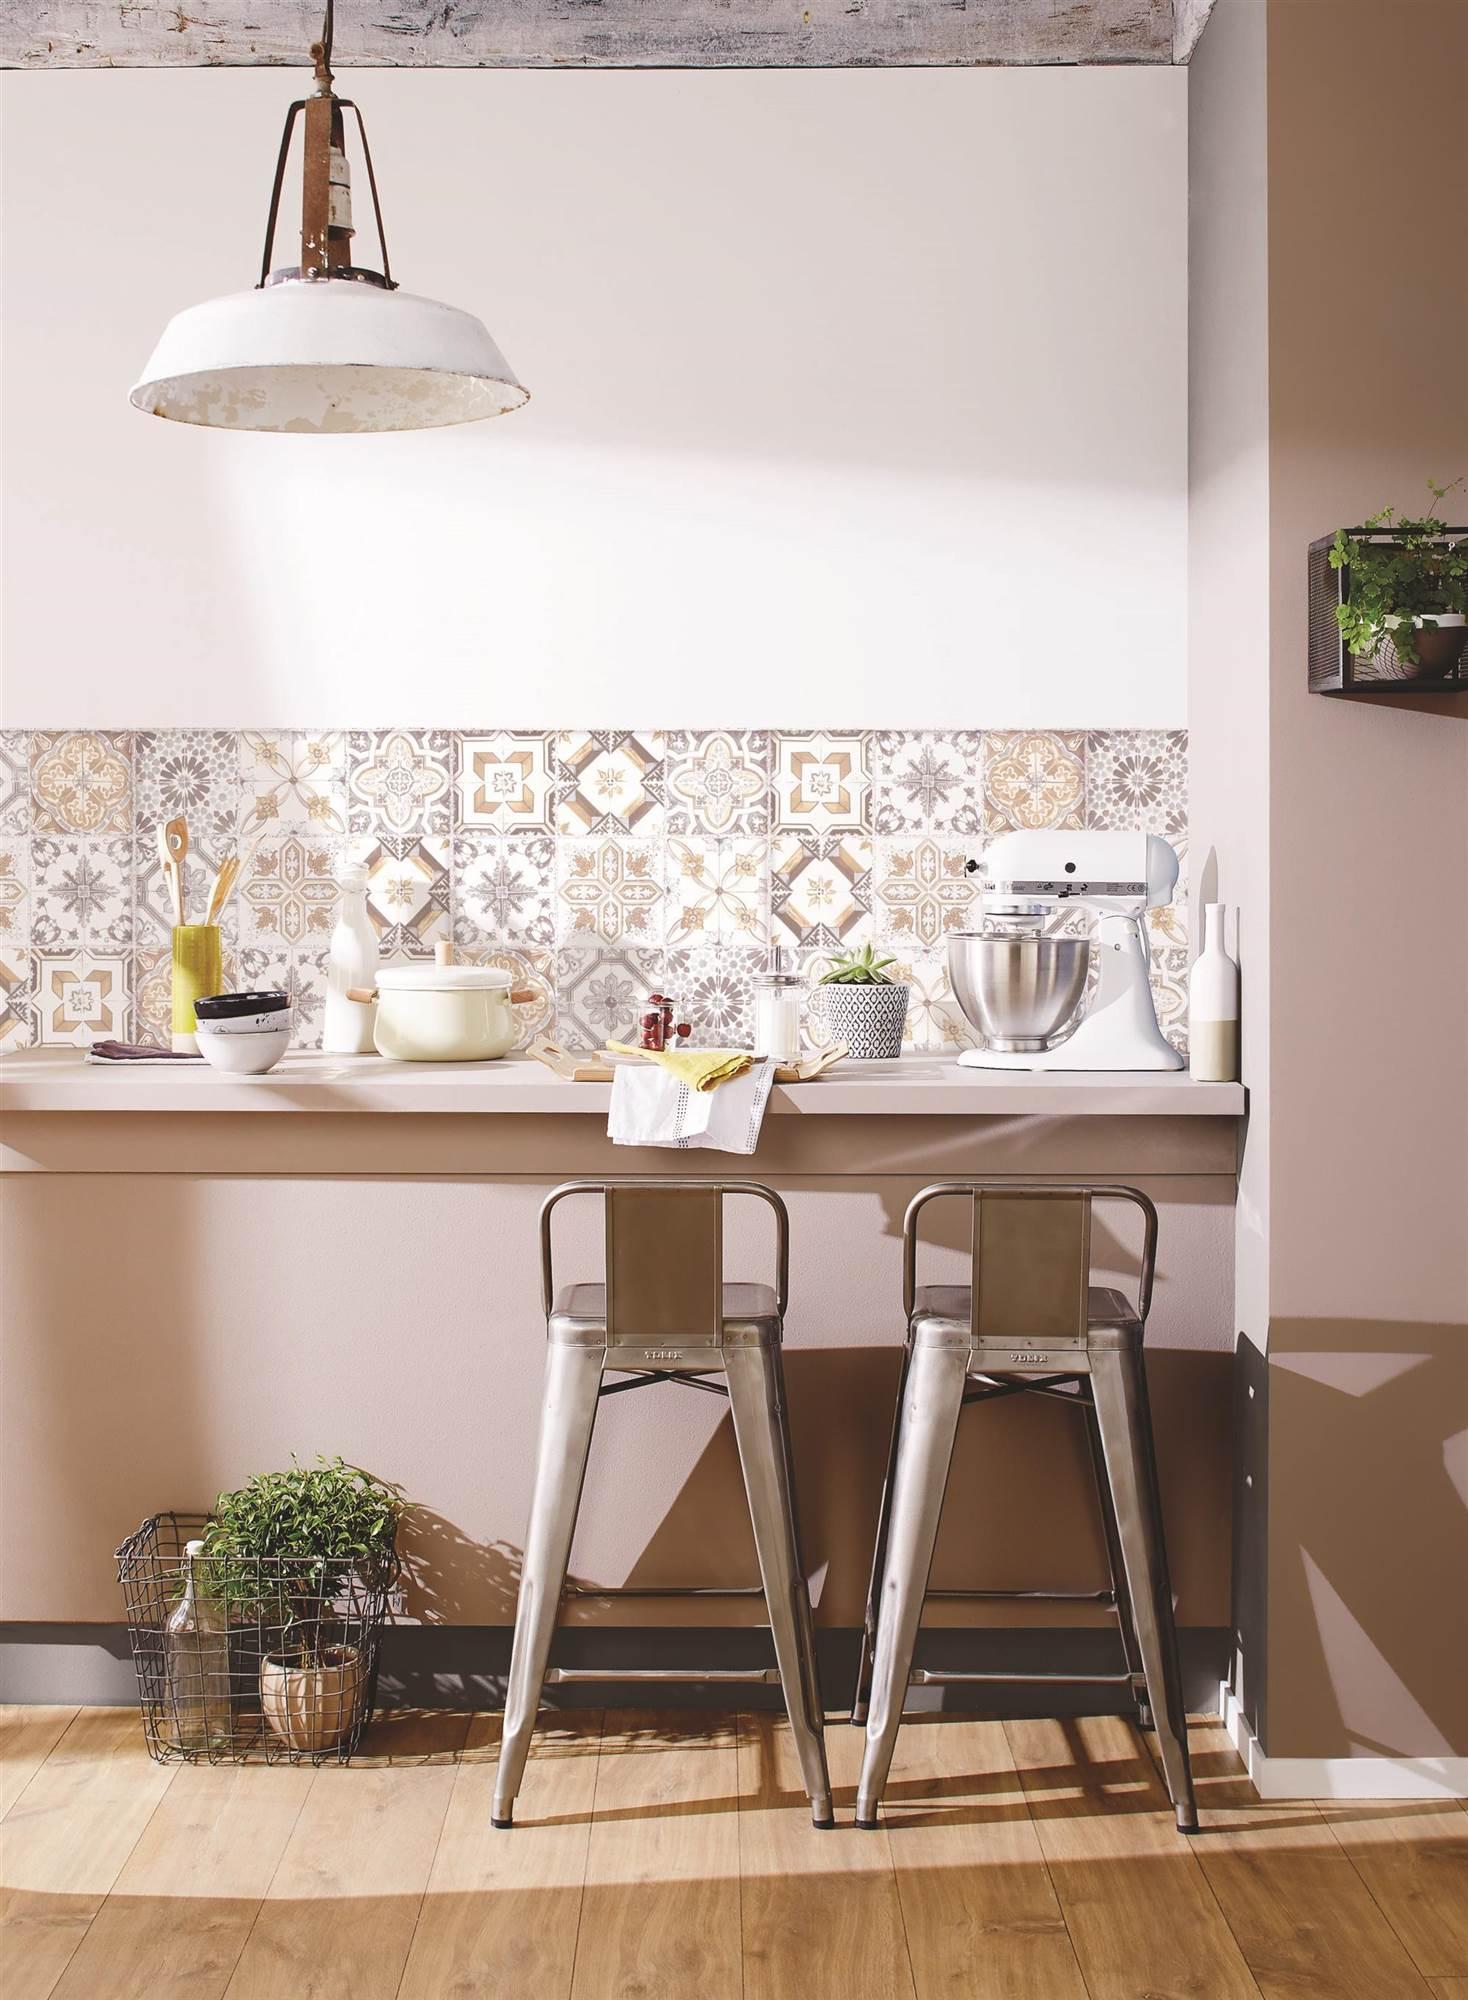 Cocinas muebles decoracin diseo blancas o pequeas